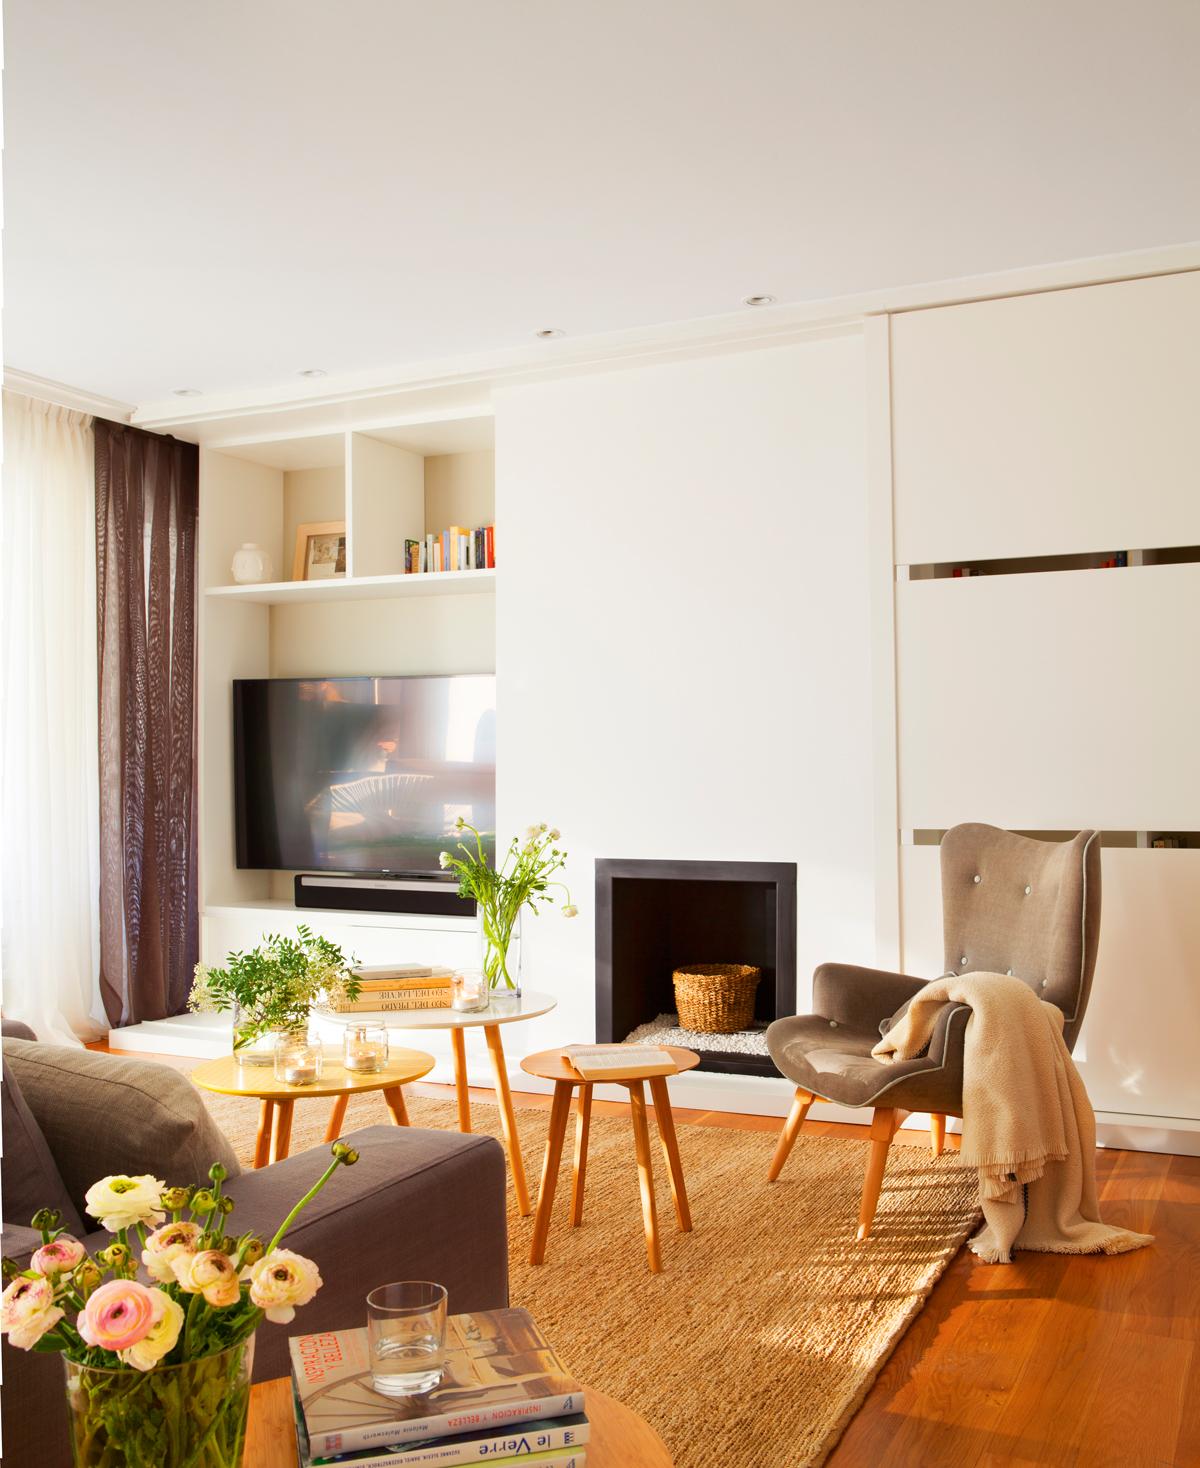 Salones peque os con muebles que aprovechan cada cent metro - Sillones de cocina ...